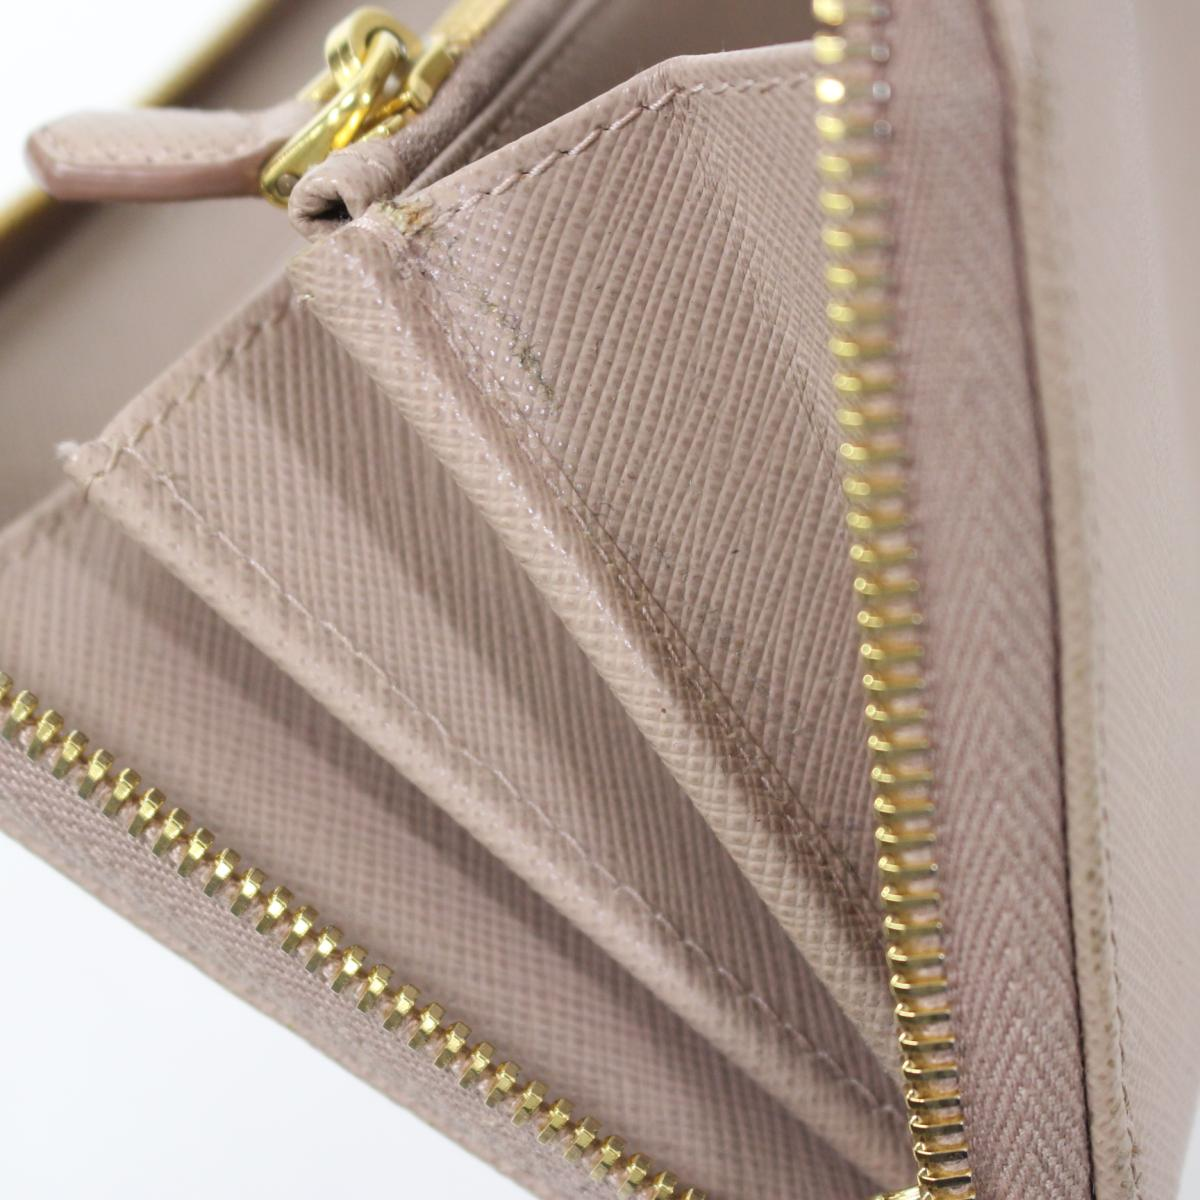 8b8014ea23 Authentic PRADA Saffiano Long Wallet Purse Leather CAMMEO Beige (1ML506)